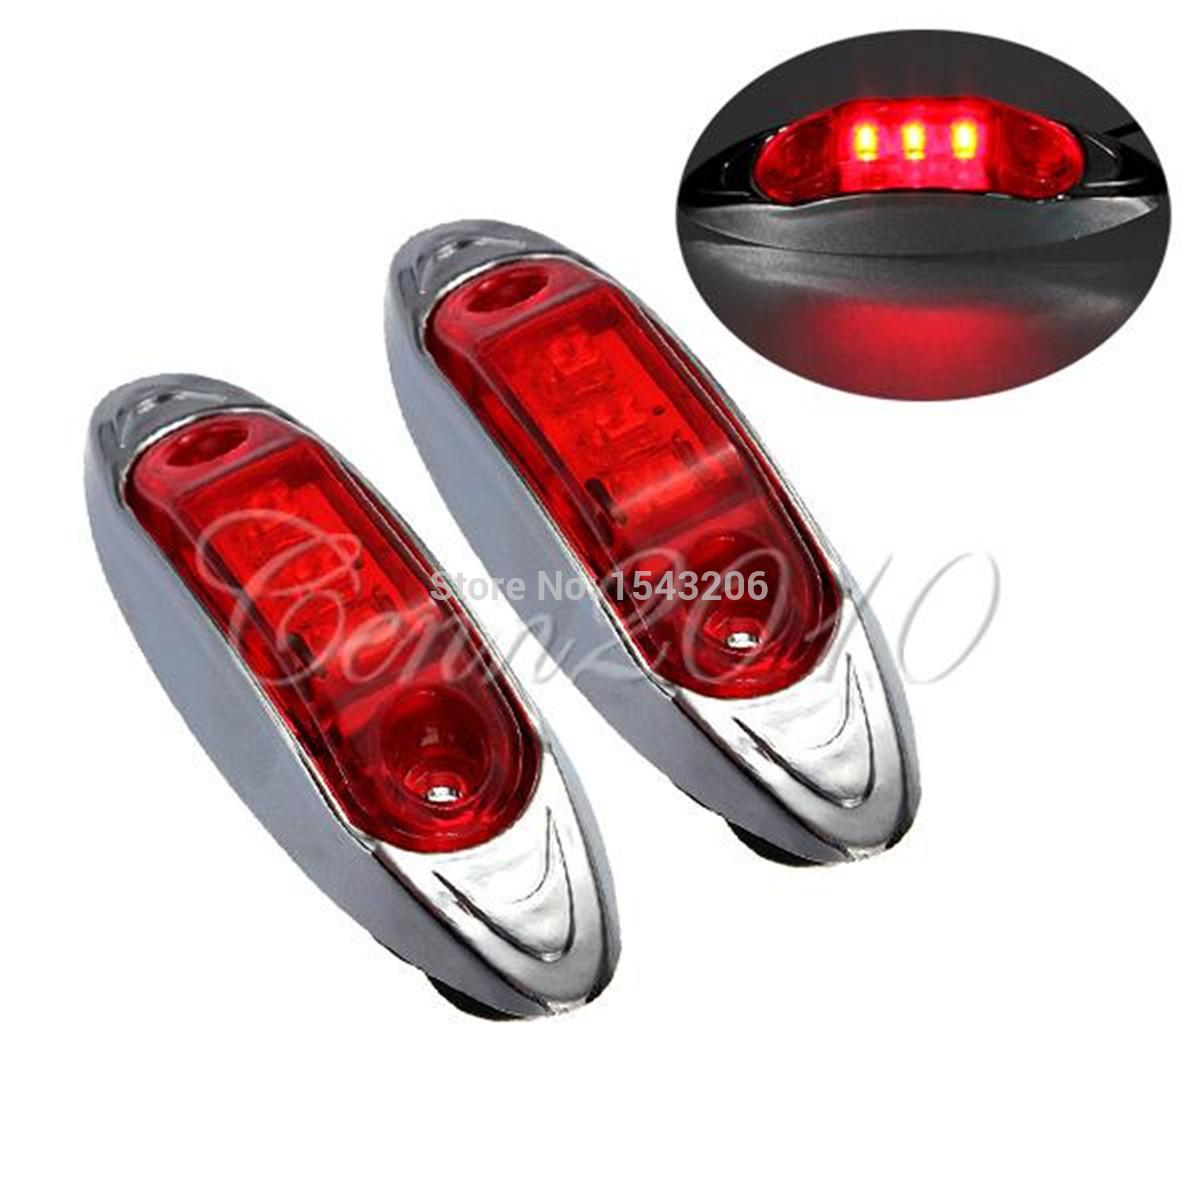 12V Trailer Truck Caravan AMBER /RED /WHITE LED Side Marker Light Lamp Clearance(China (Mainland))